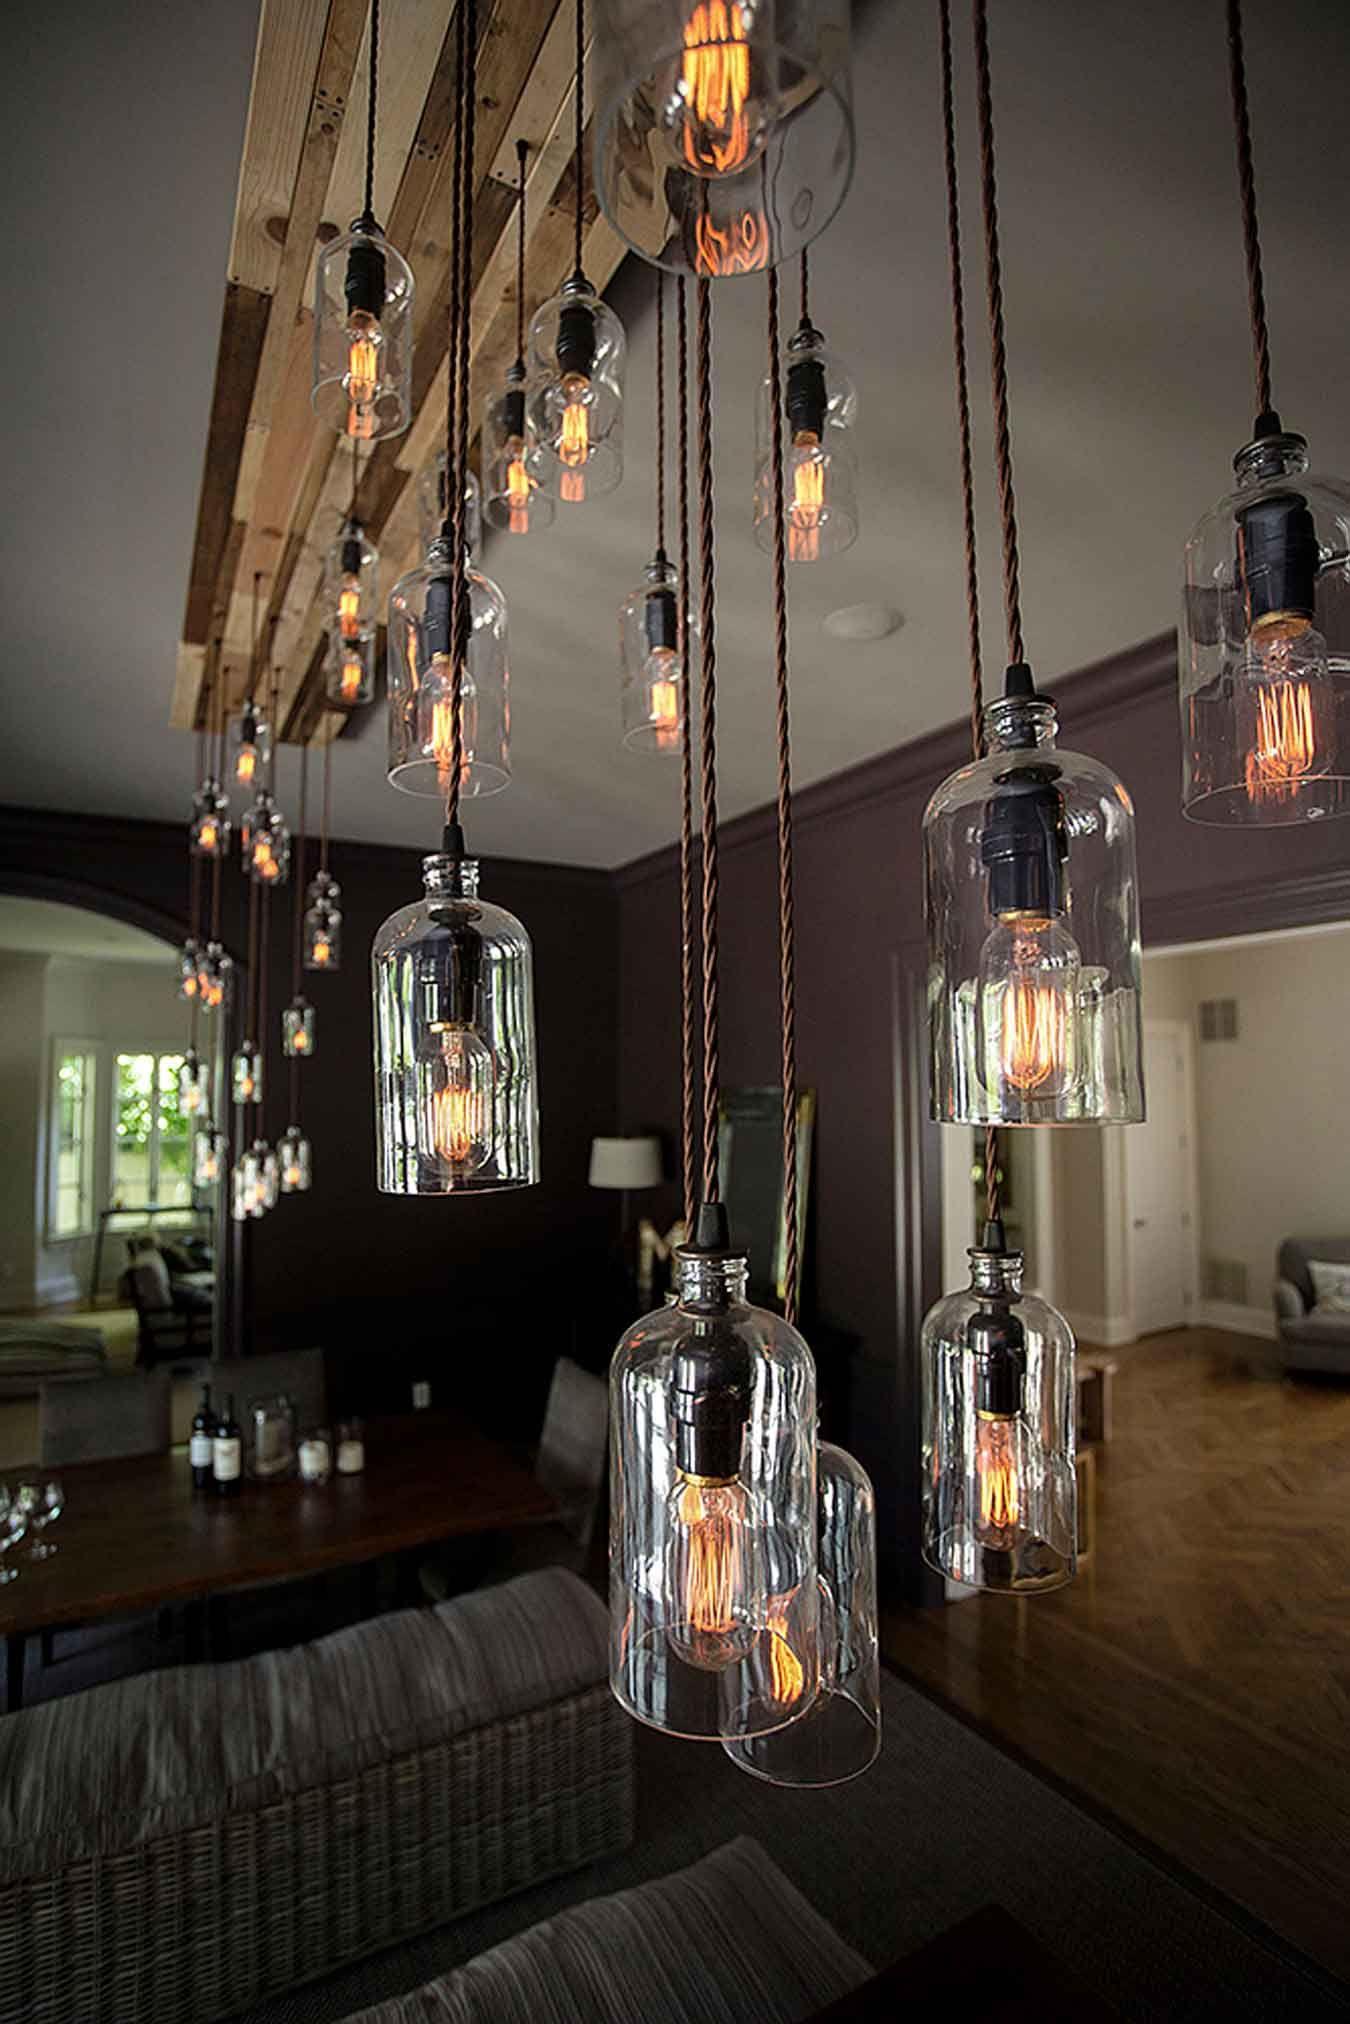 Modern Rustic Chandelier Custom Lighting At Moonshine Lamp Co Modern Rustic Decor Custom Chandelier Modern Rustic Chandelier